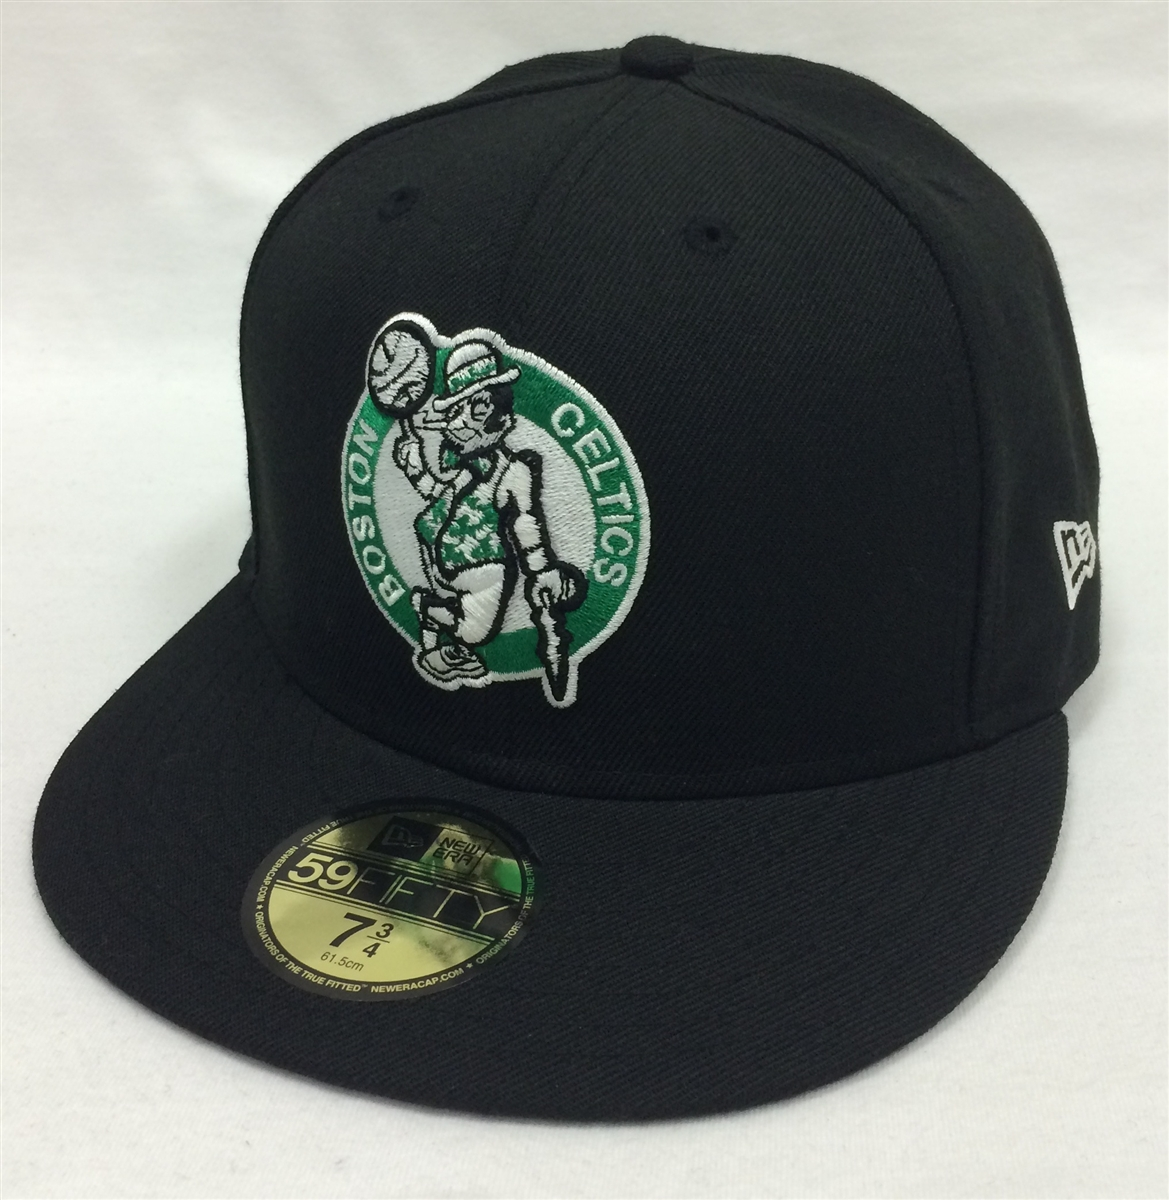 New Era 59Fifty HWC Basic Boston Celtics Black Fitted Cap b3048ee8405